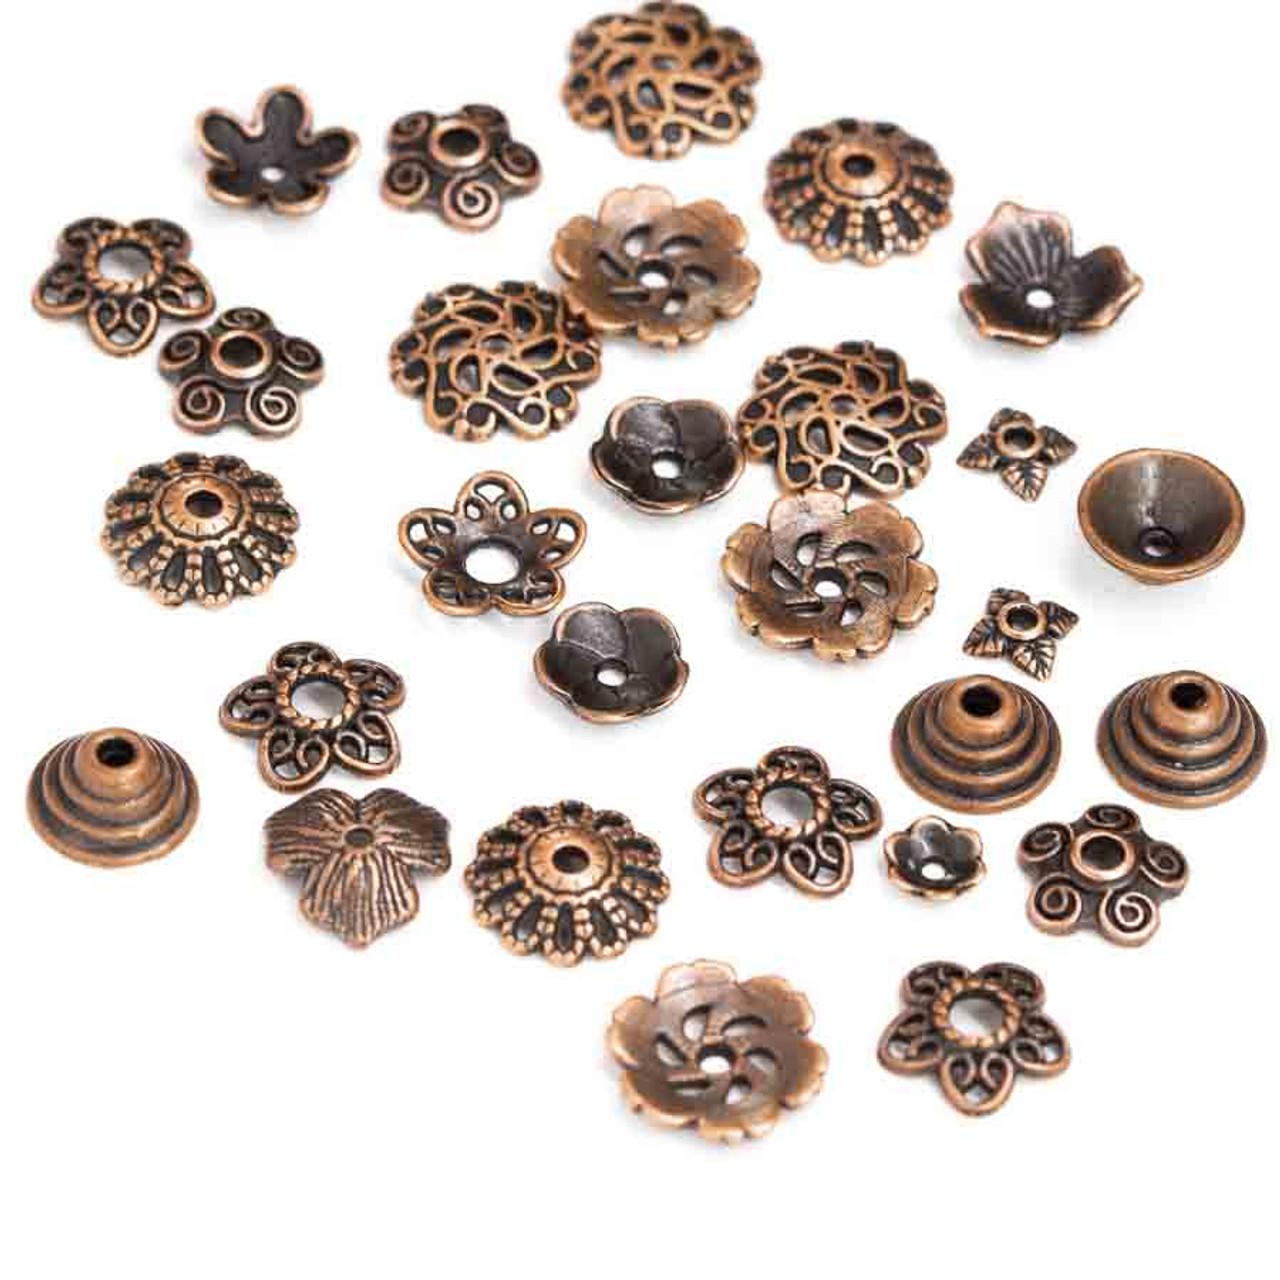 40 9.5 MM Copper Filigree Bead Caps